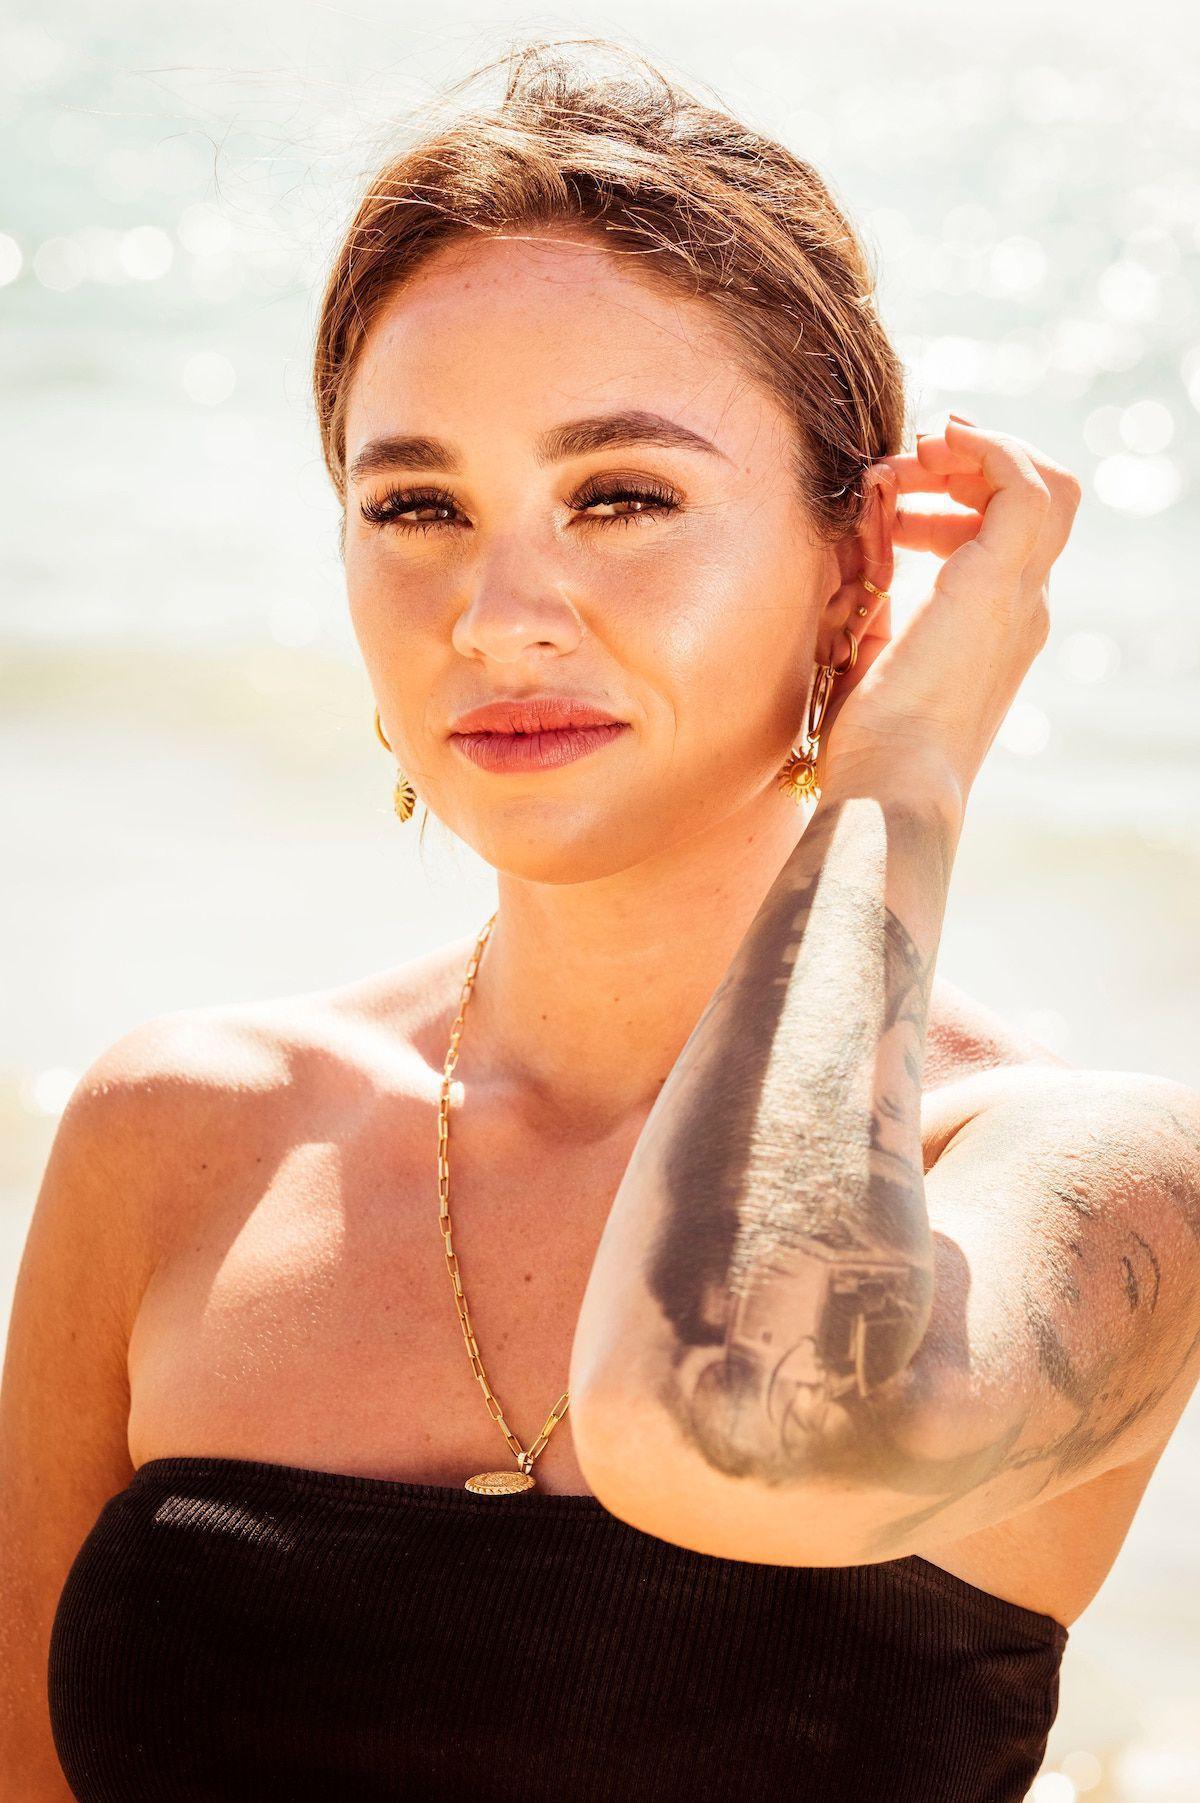 """Kampf der Realitystars"": Melissa Damilia nimmt nicht wegen Fame teil"